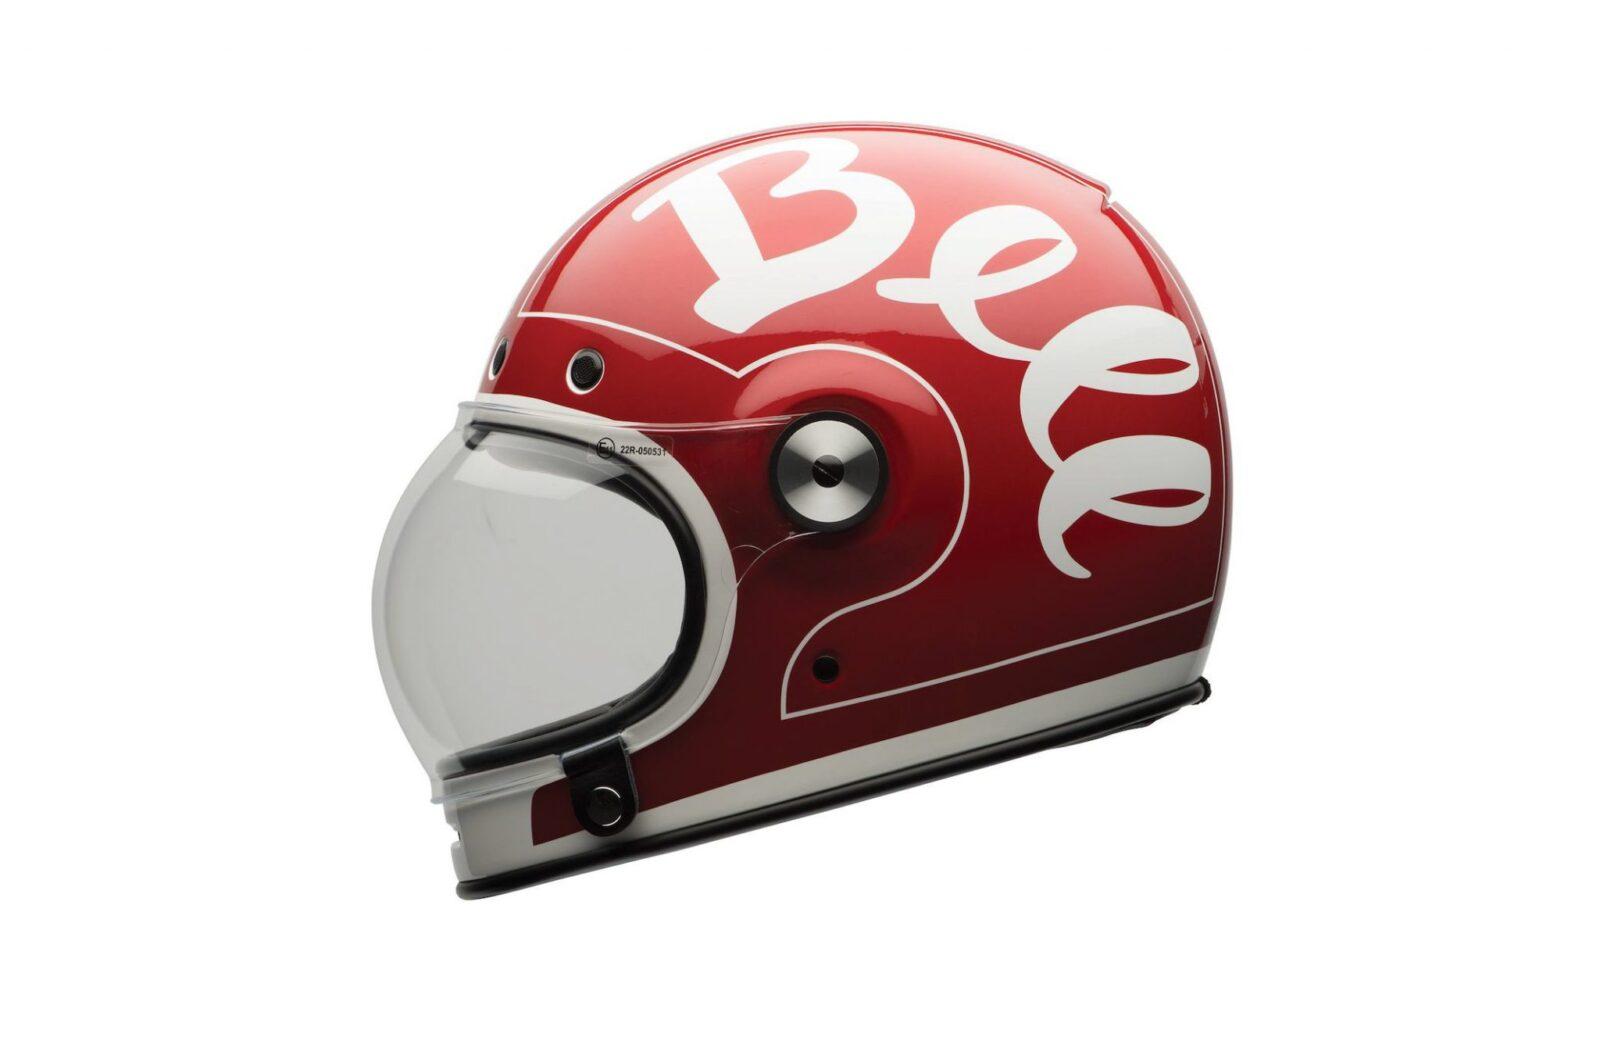 Bell Bullitt Skratch LE Helmet 1600x1041 - Bell Bullitt Skratch LE Helmet